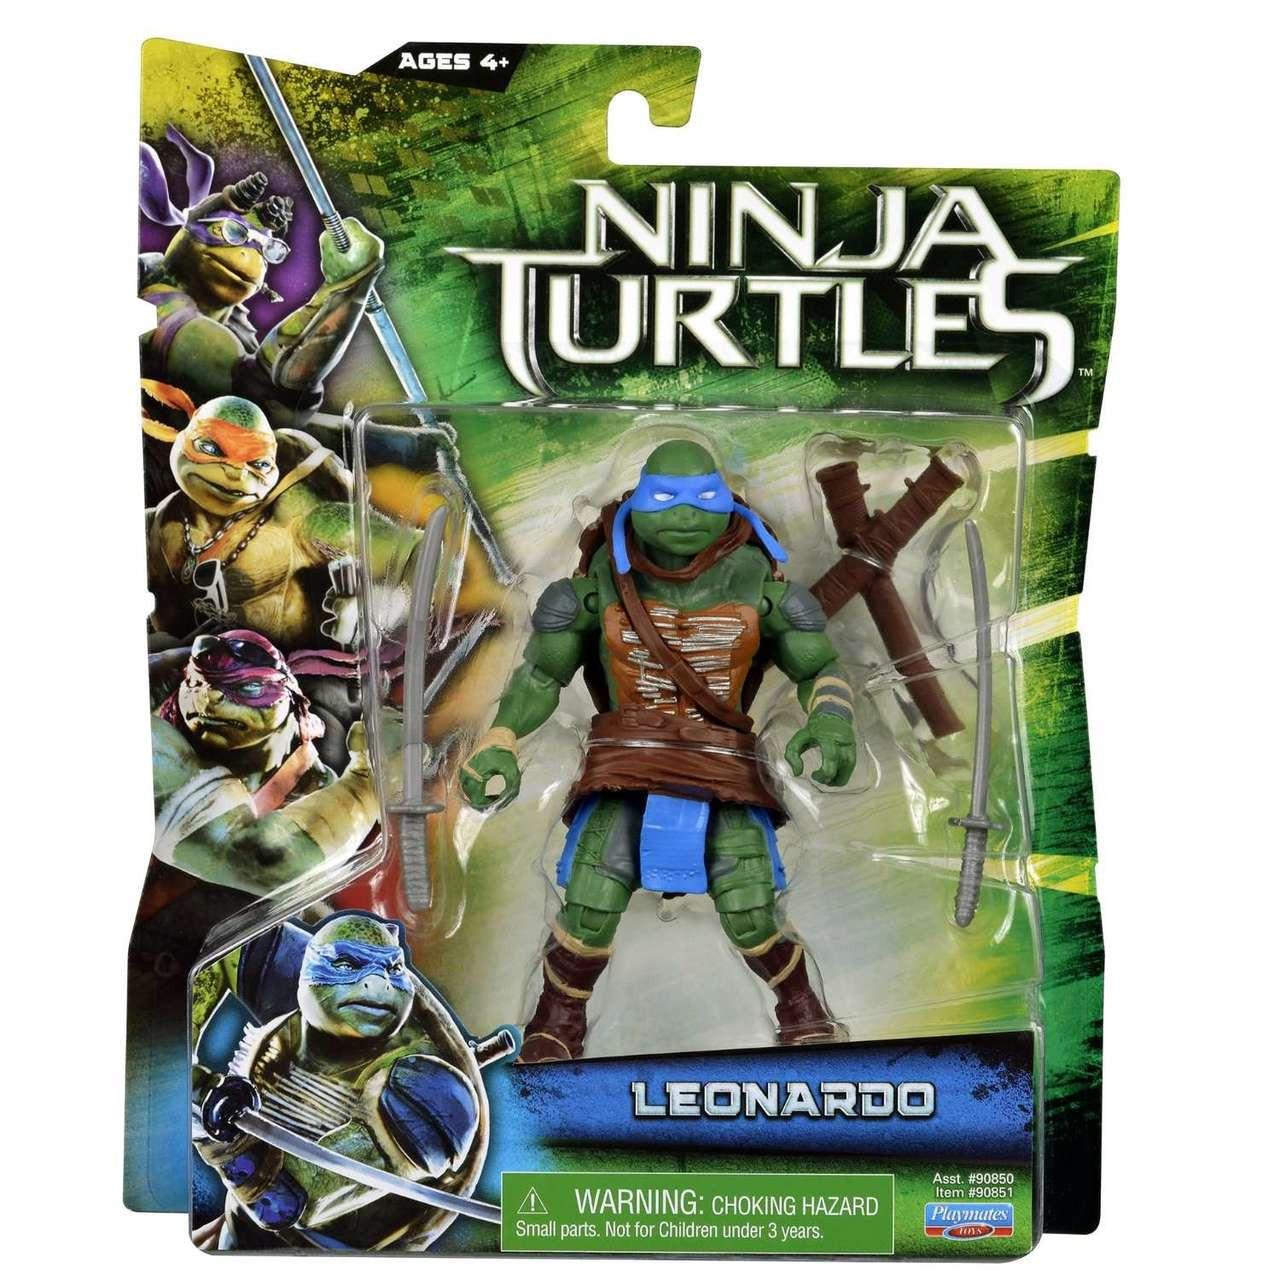 LEONARDO Teenage Mutant Ninja Turtles Combat Warrior Collectible Action Figure